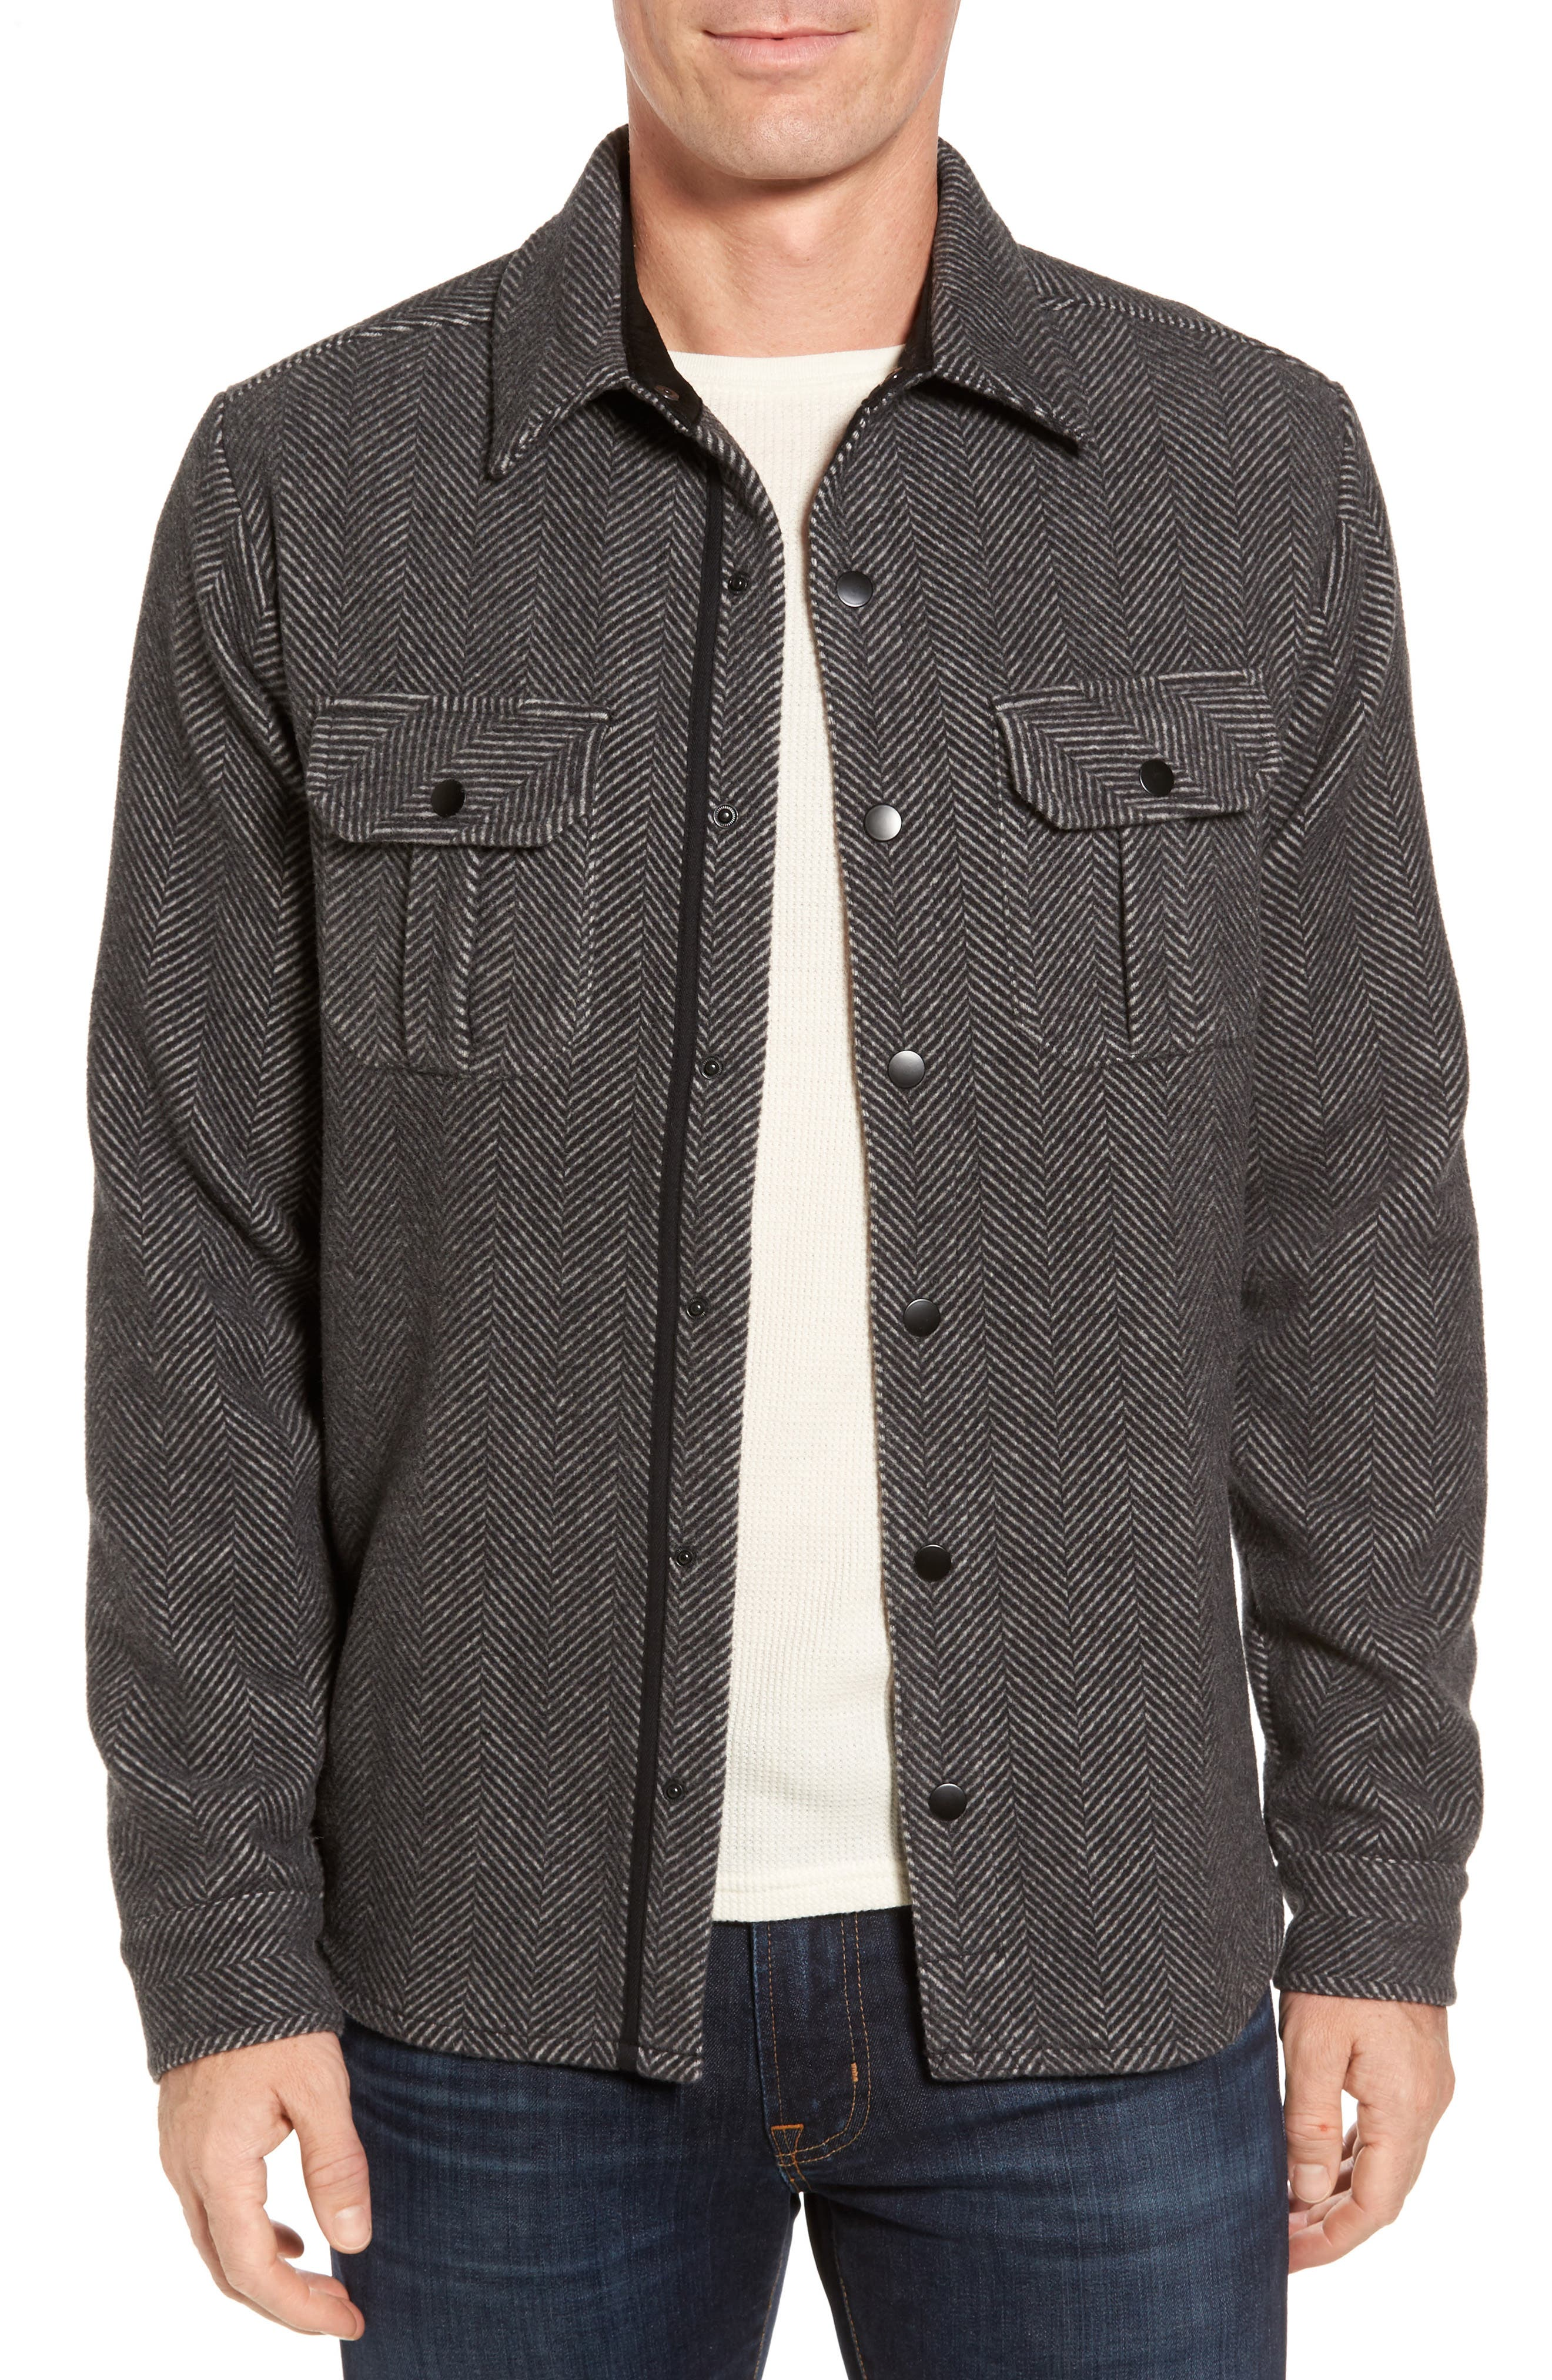 Anchor Line Herringbone Wool Blend Shirt Jacket,                             Main thumbnail 1, color,